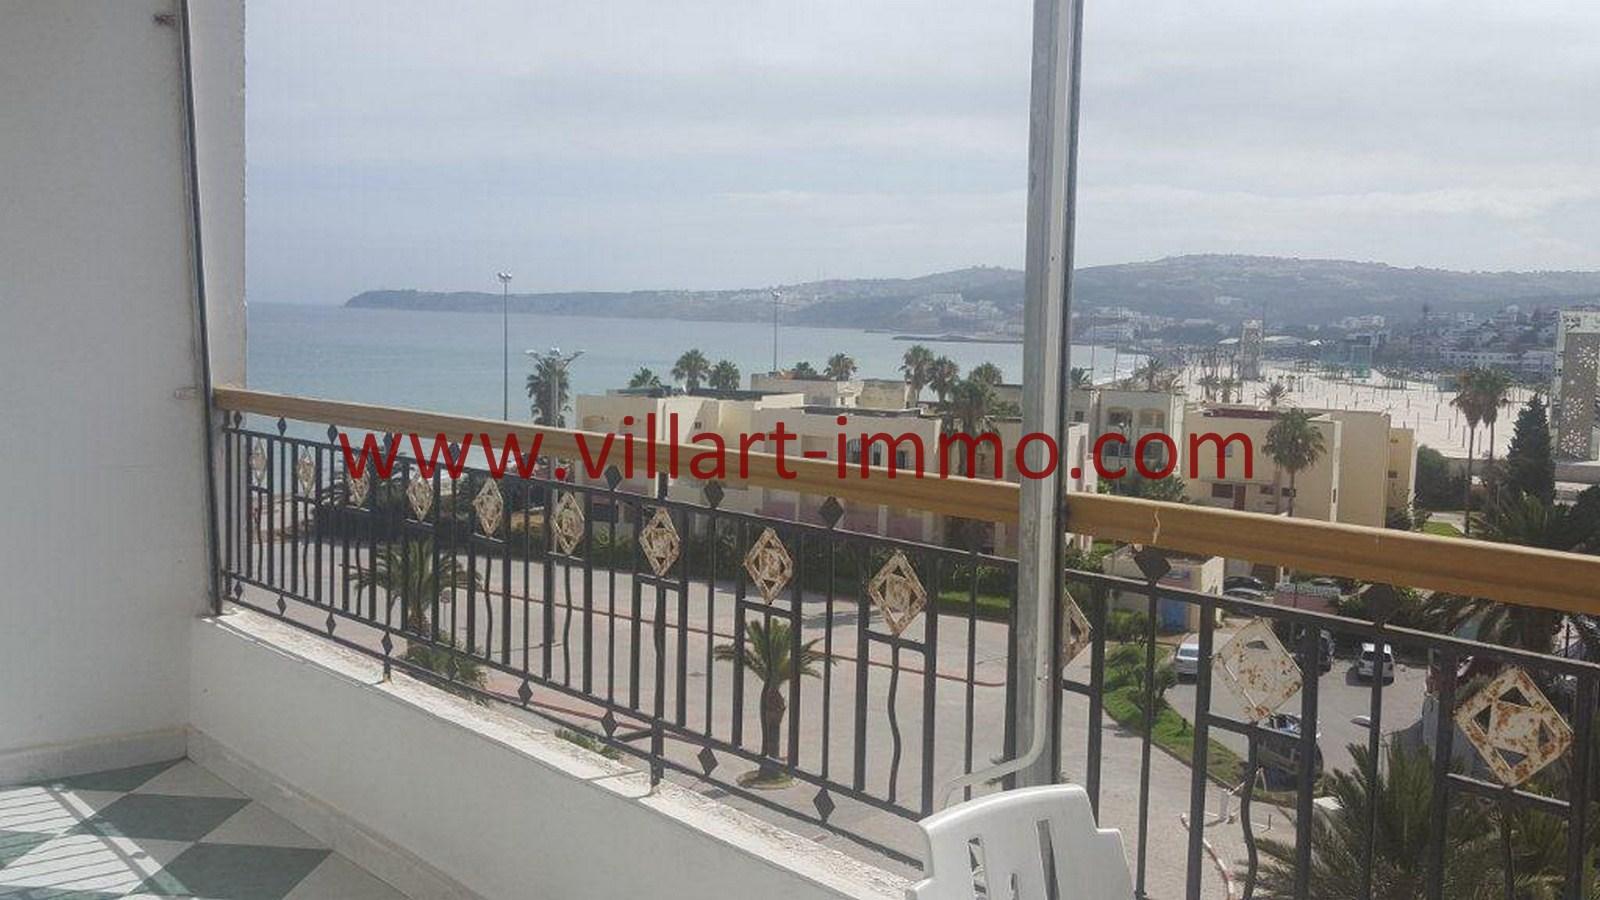 3-Vente-Appartement-Tanger-Malabata-Vue2-VA507-Villart Immo